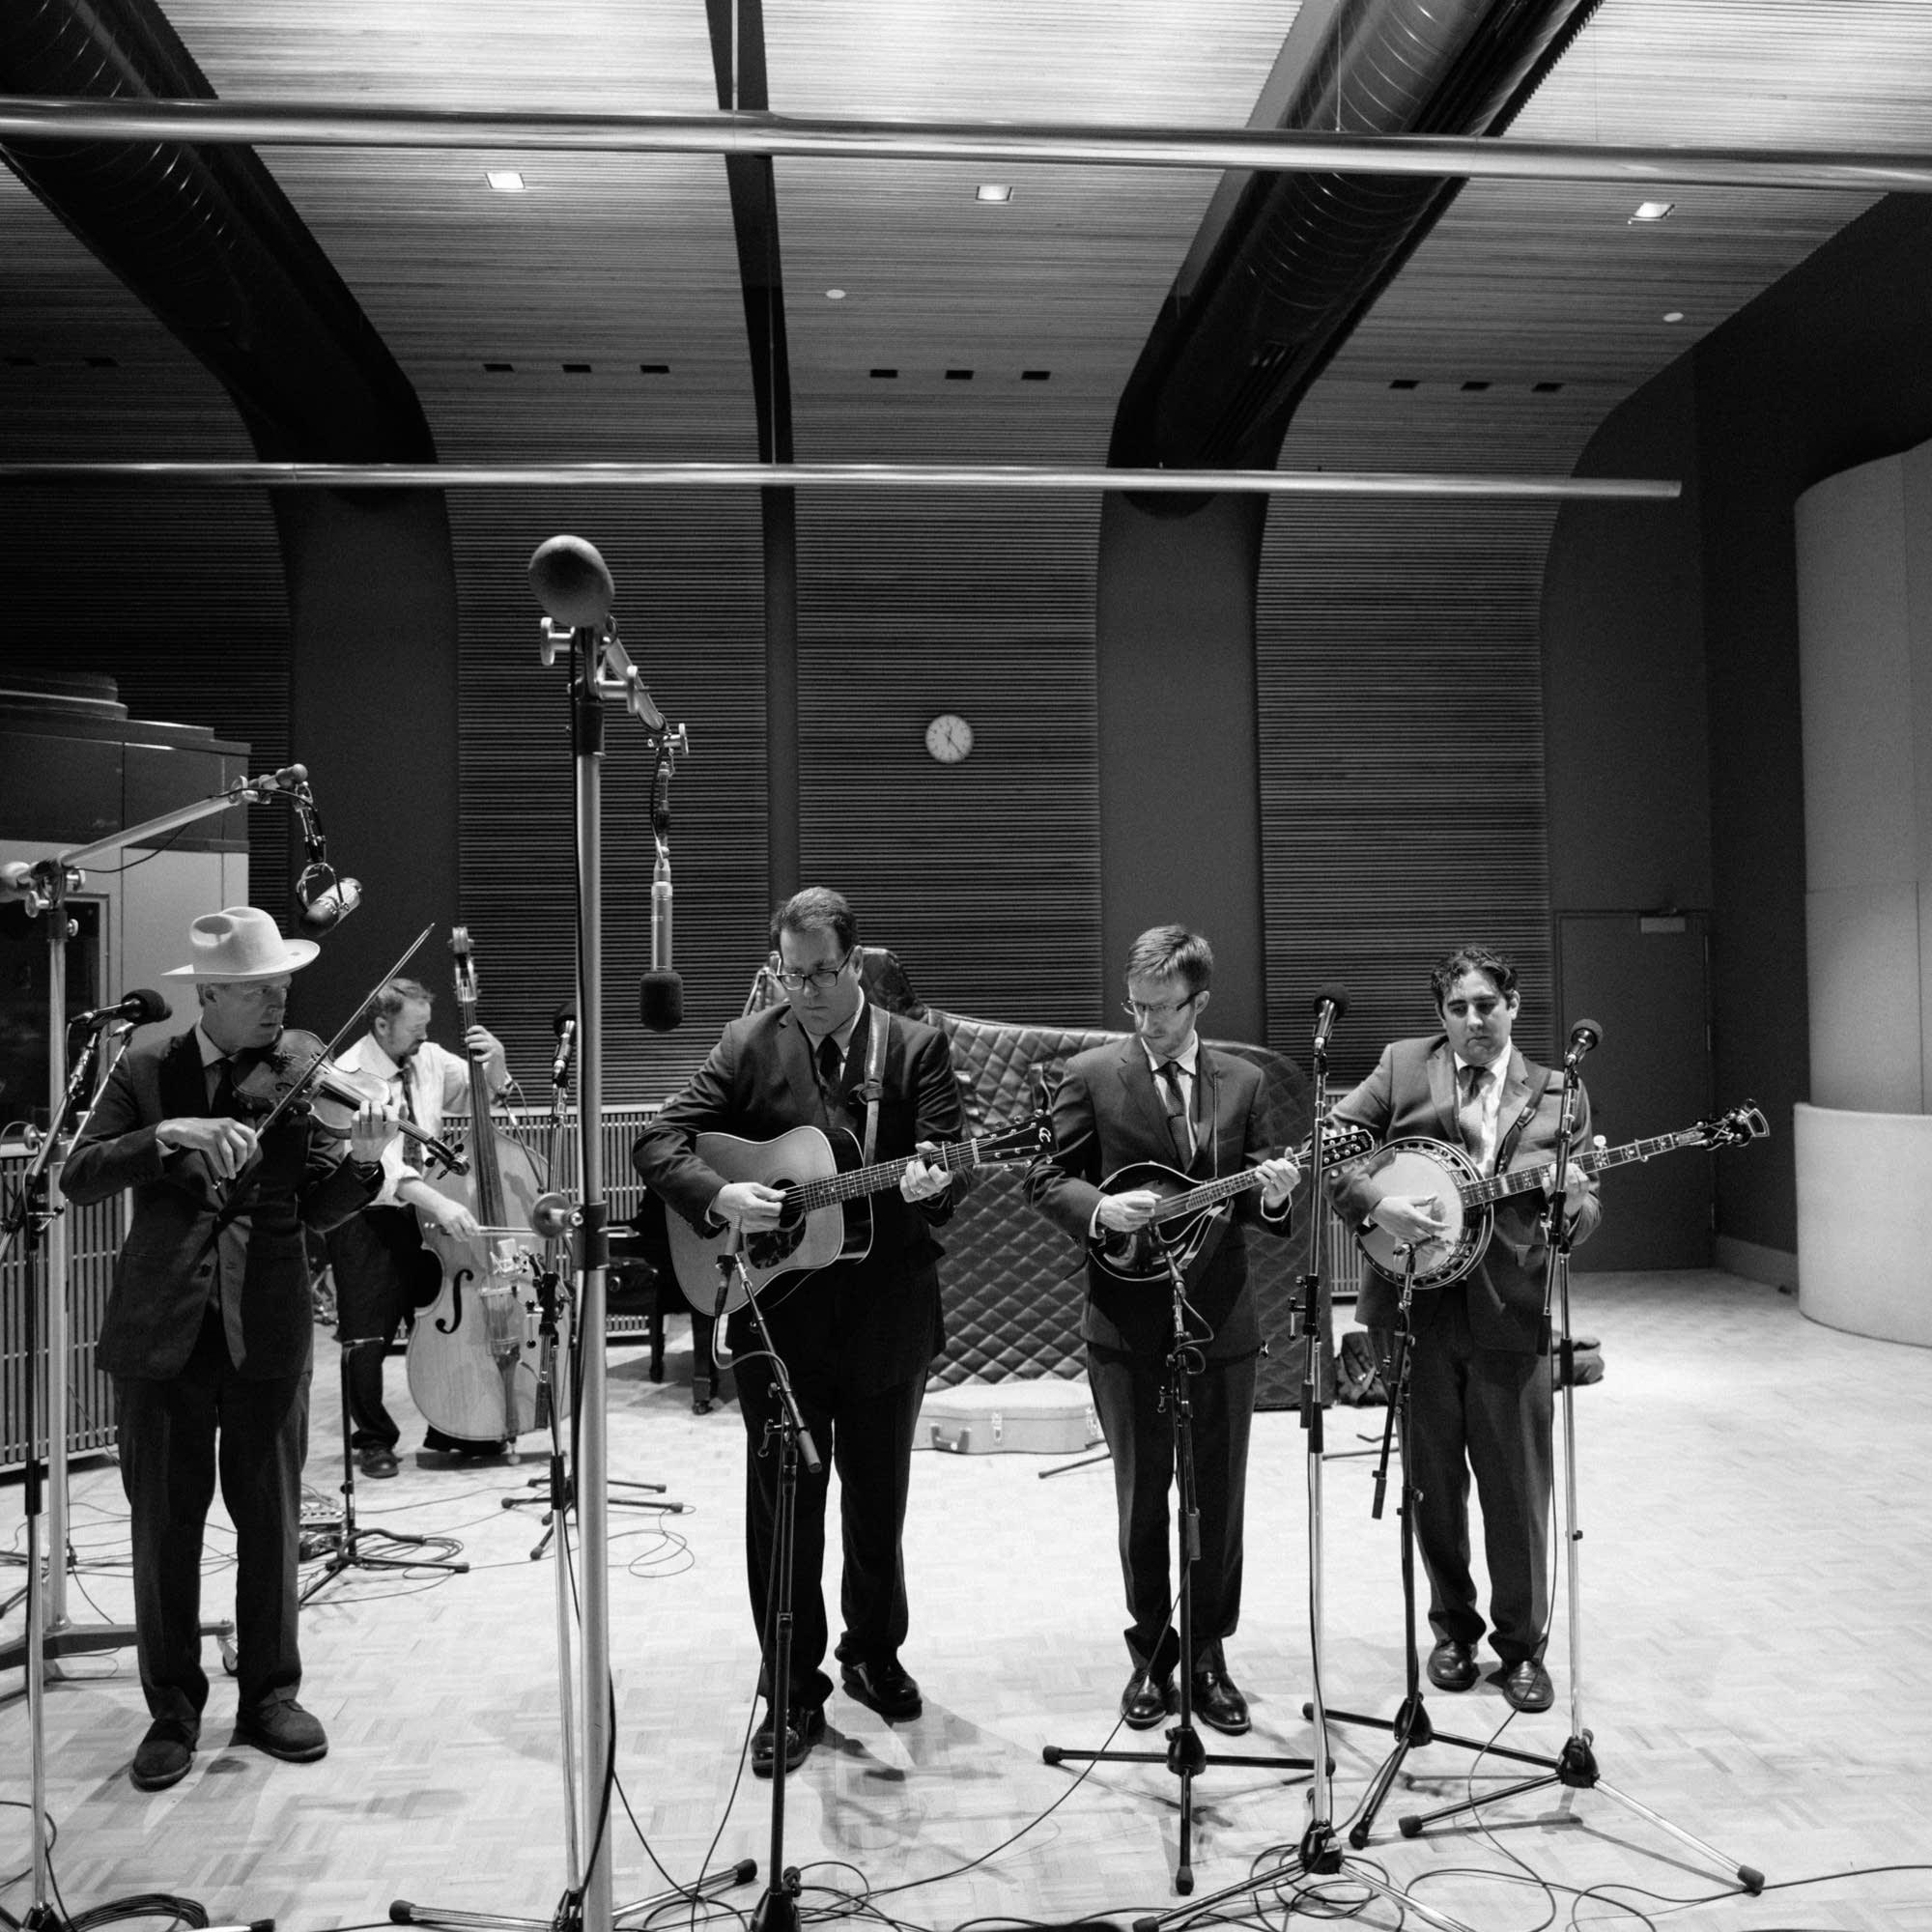 The High 48s perform in the Radio Heartland studio